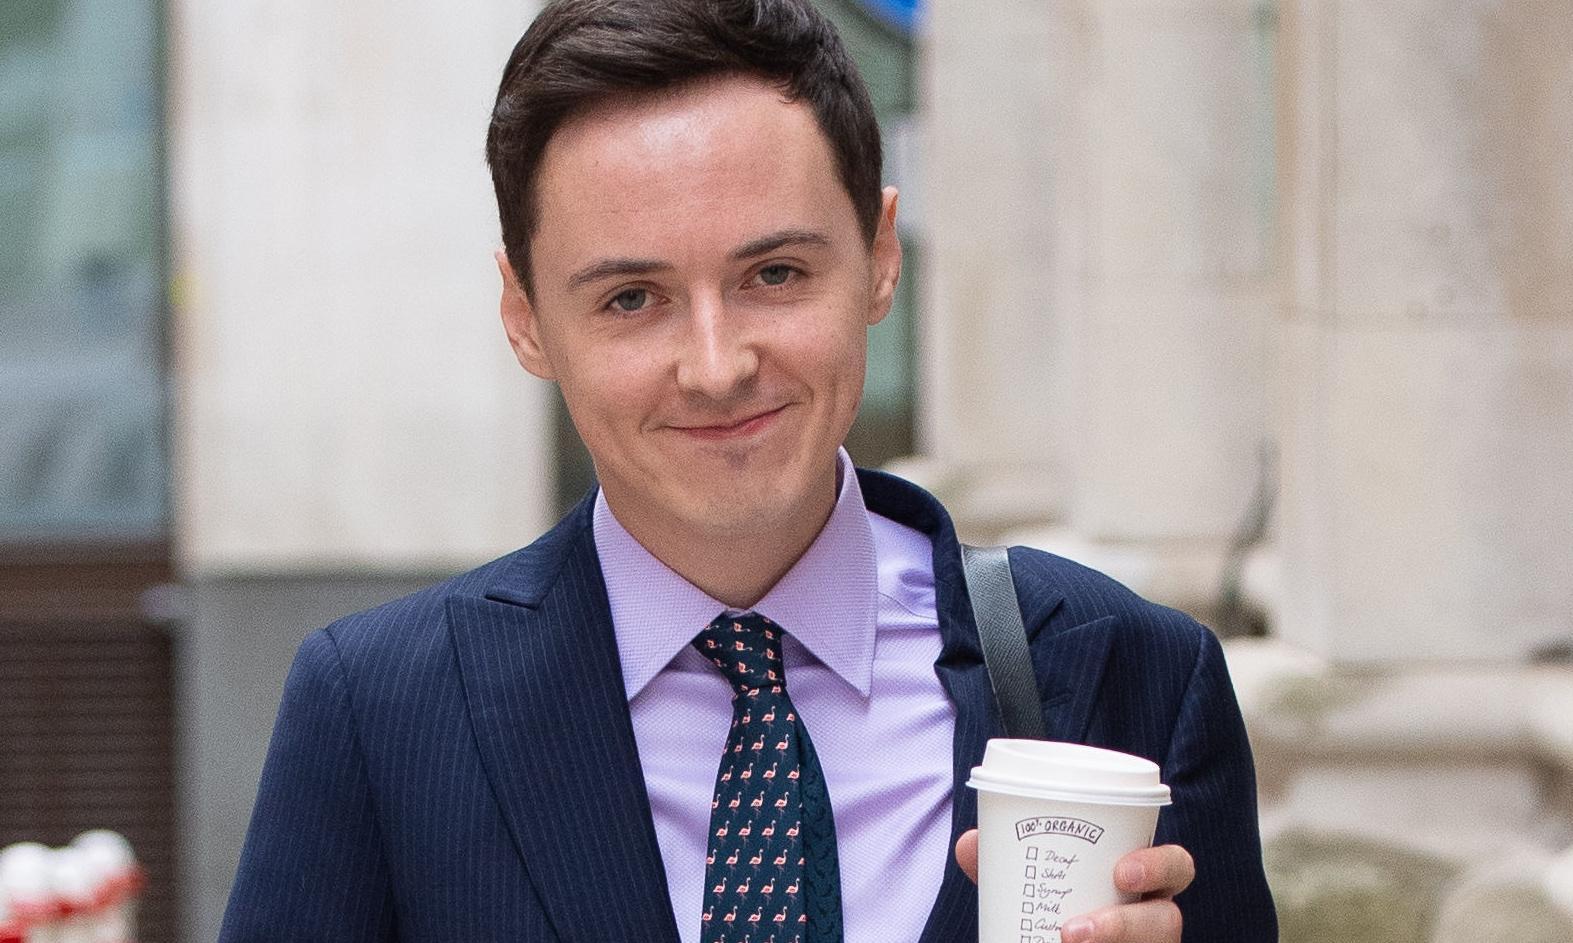 Pro-Brexit activist wins appeal against £20,000 electoral spending fine